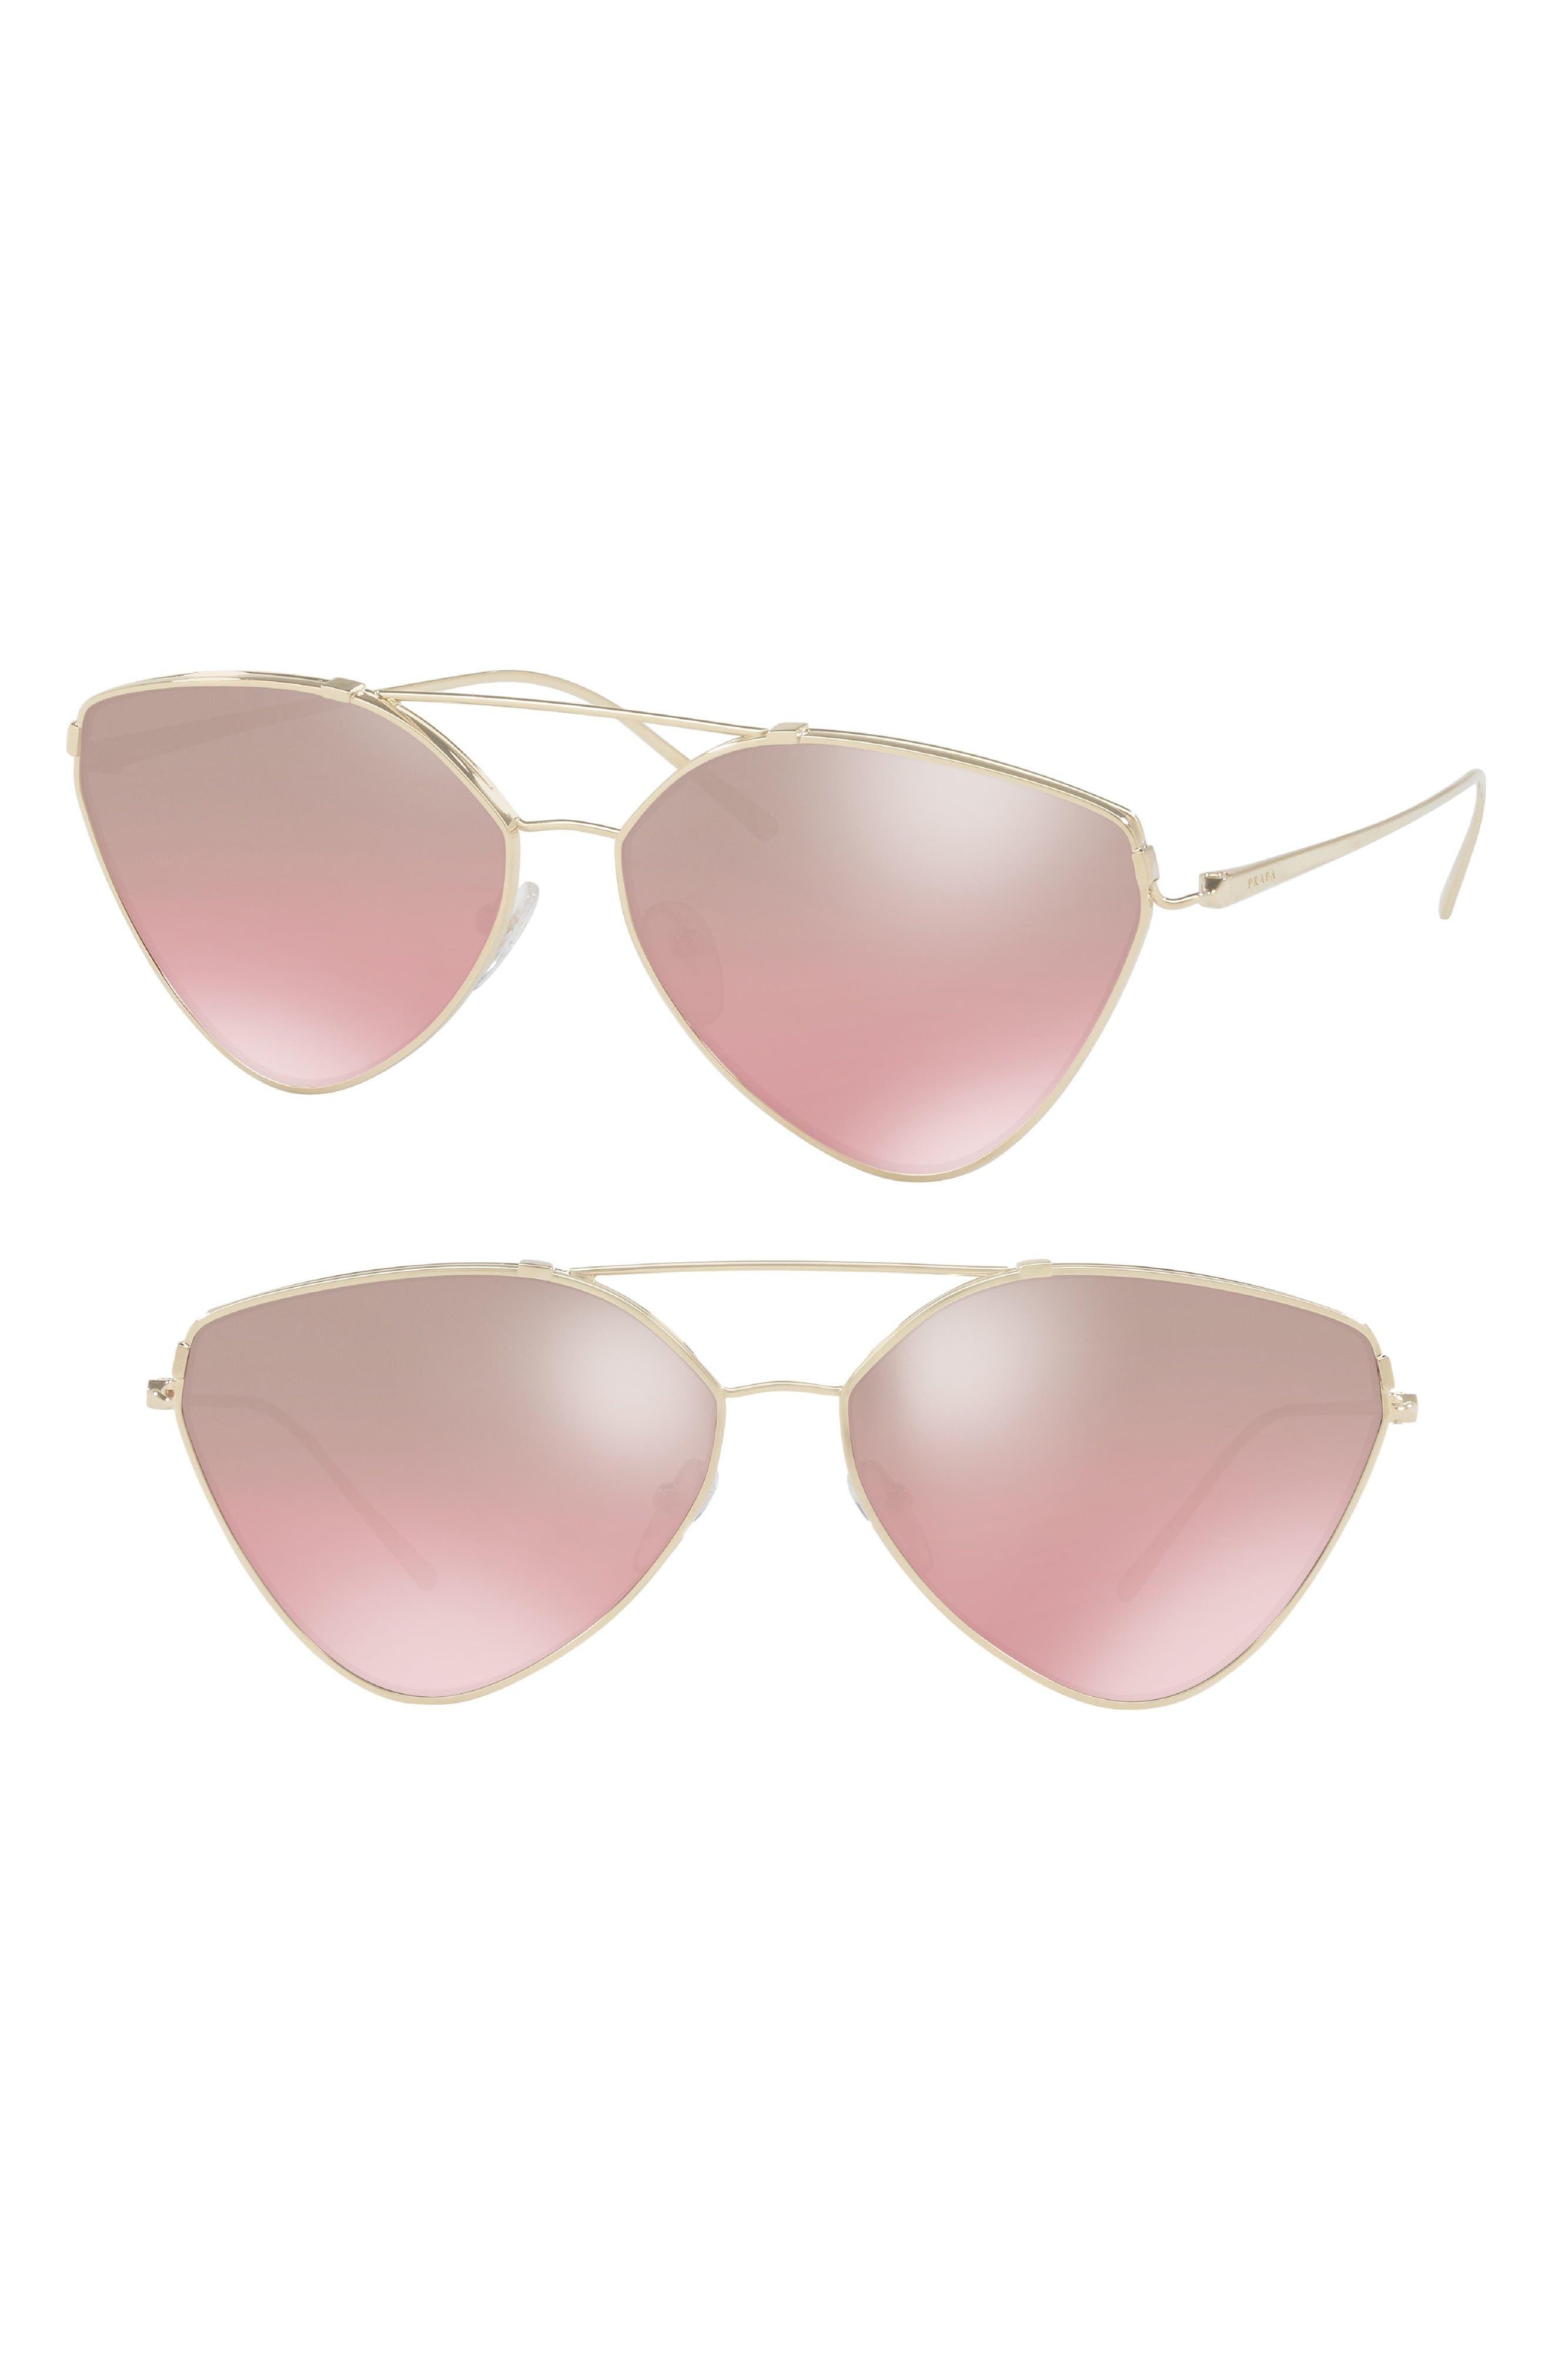 62mm Gradient Aviator Sunglasses,                         Main,                         color, 650